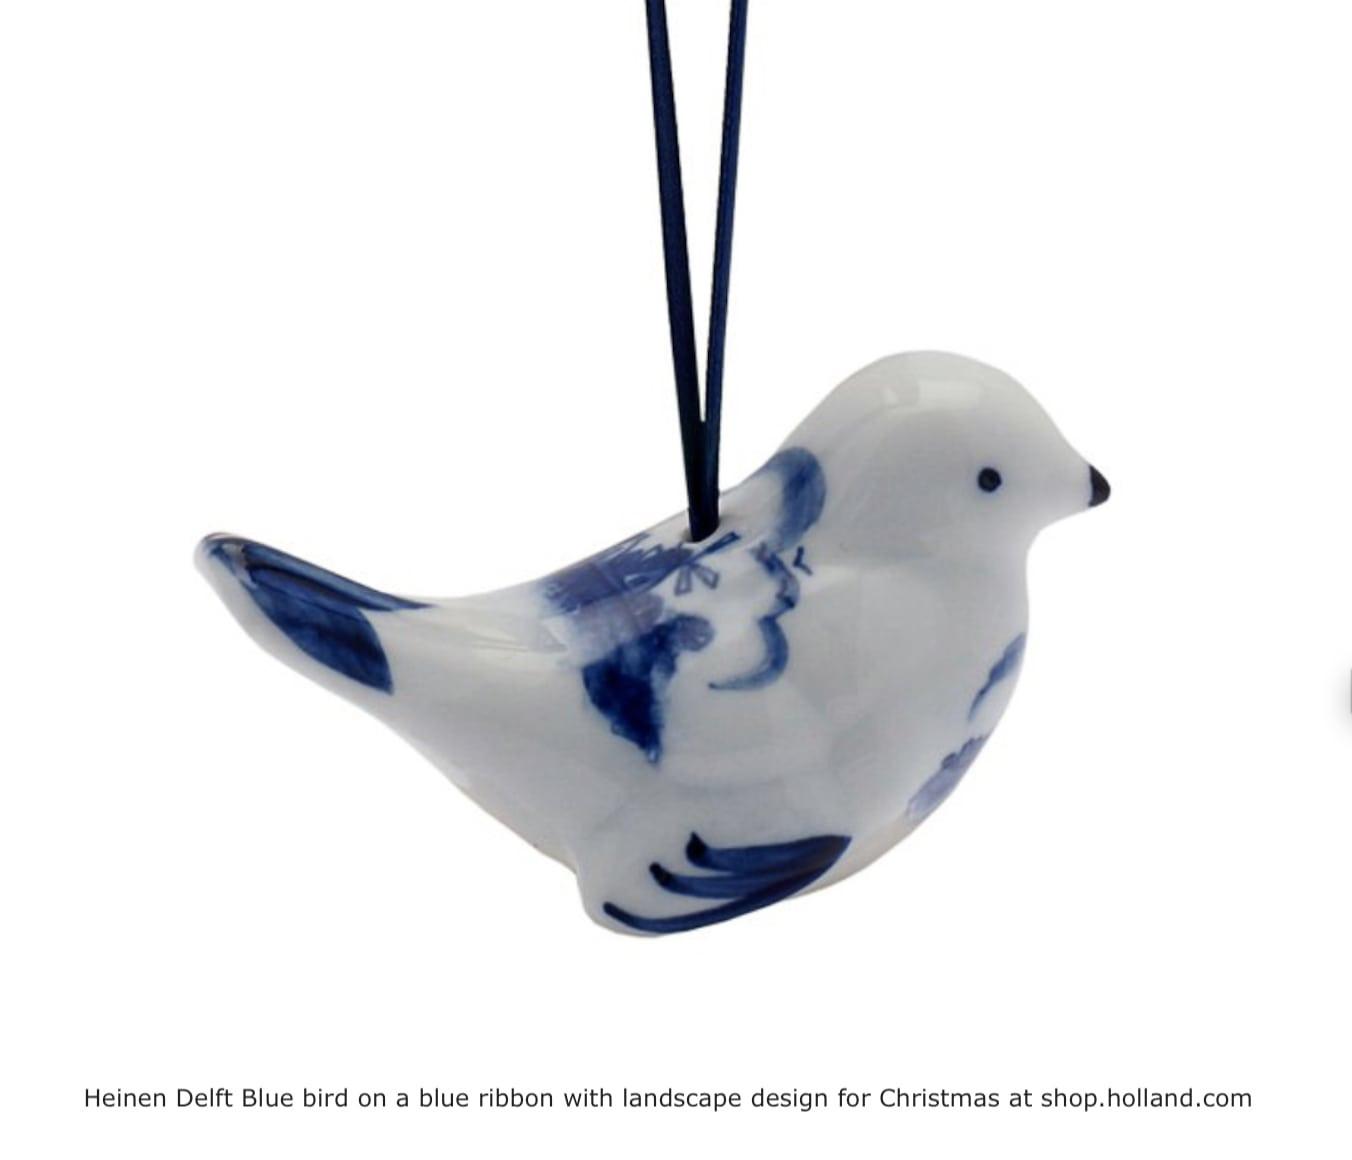 Delfter Blau Christbaumschmuck Vogel Shop Holland Com